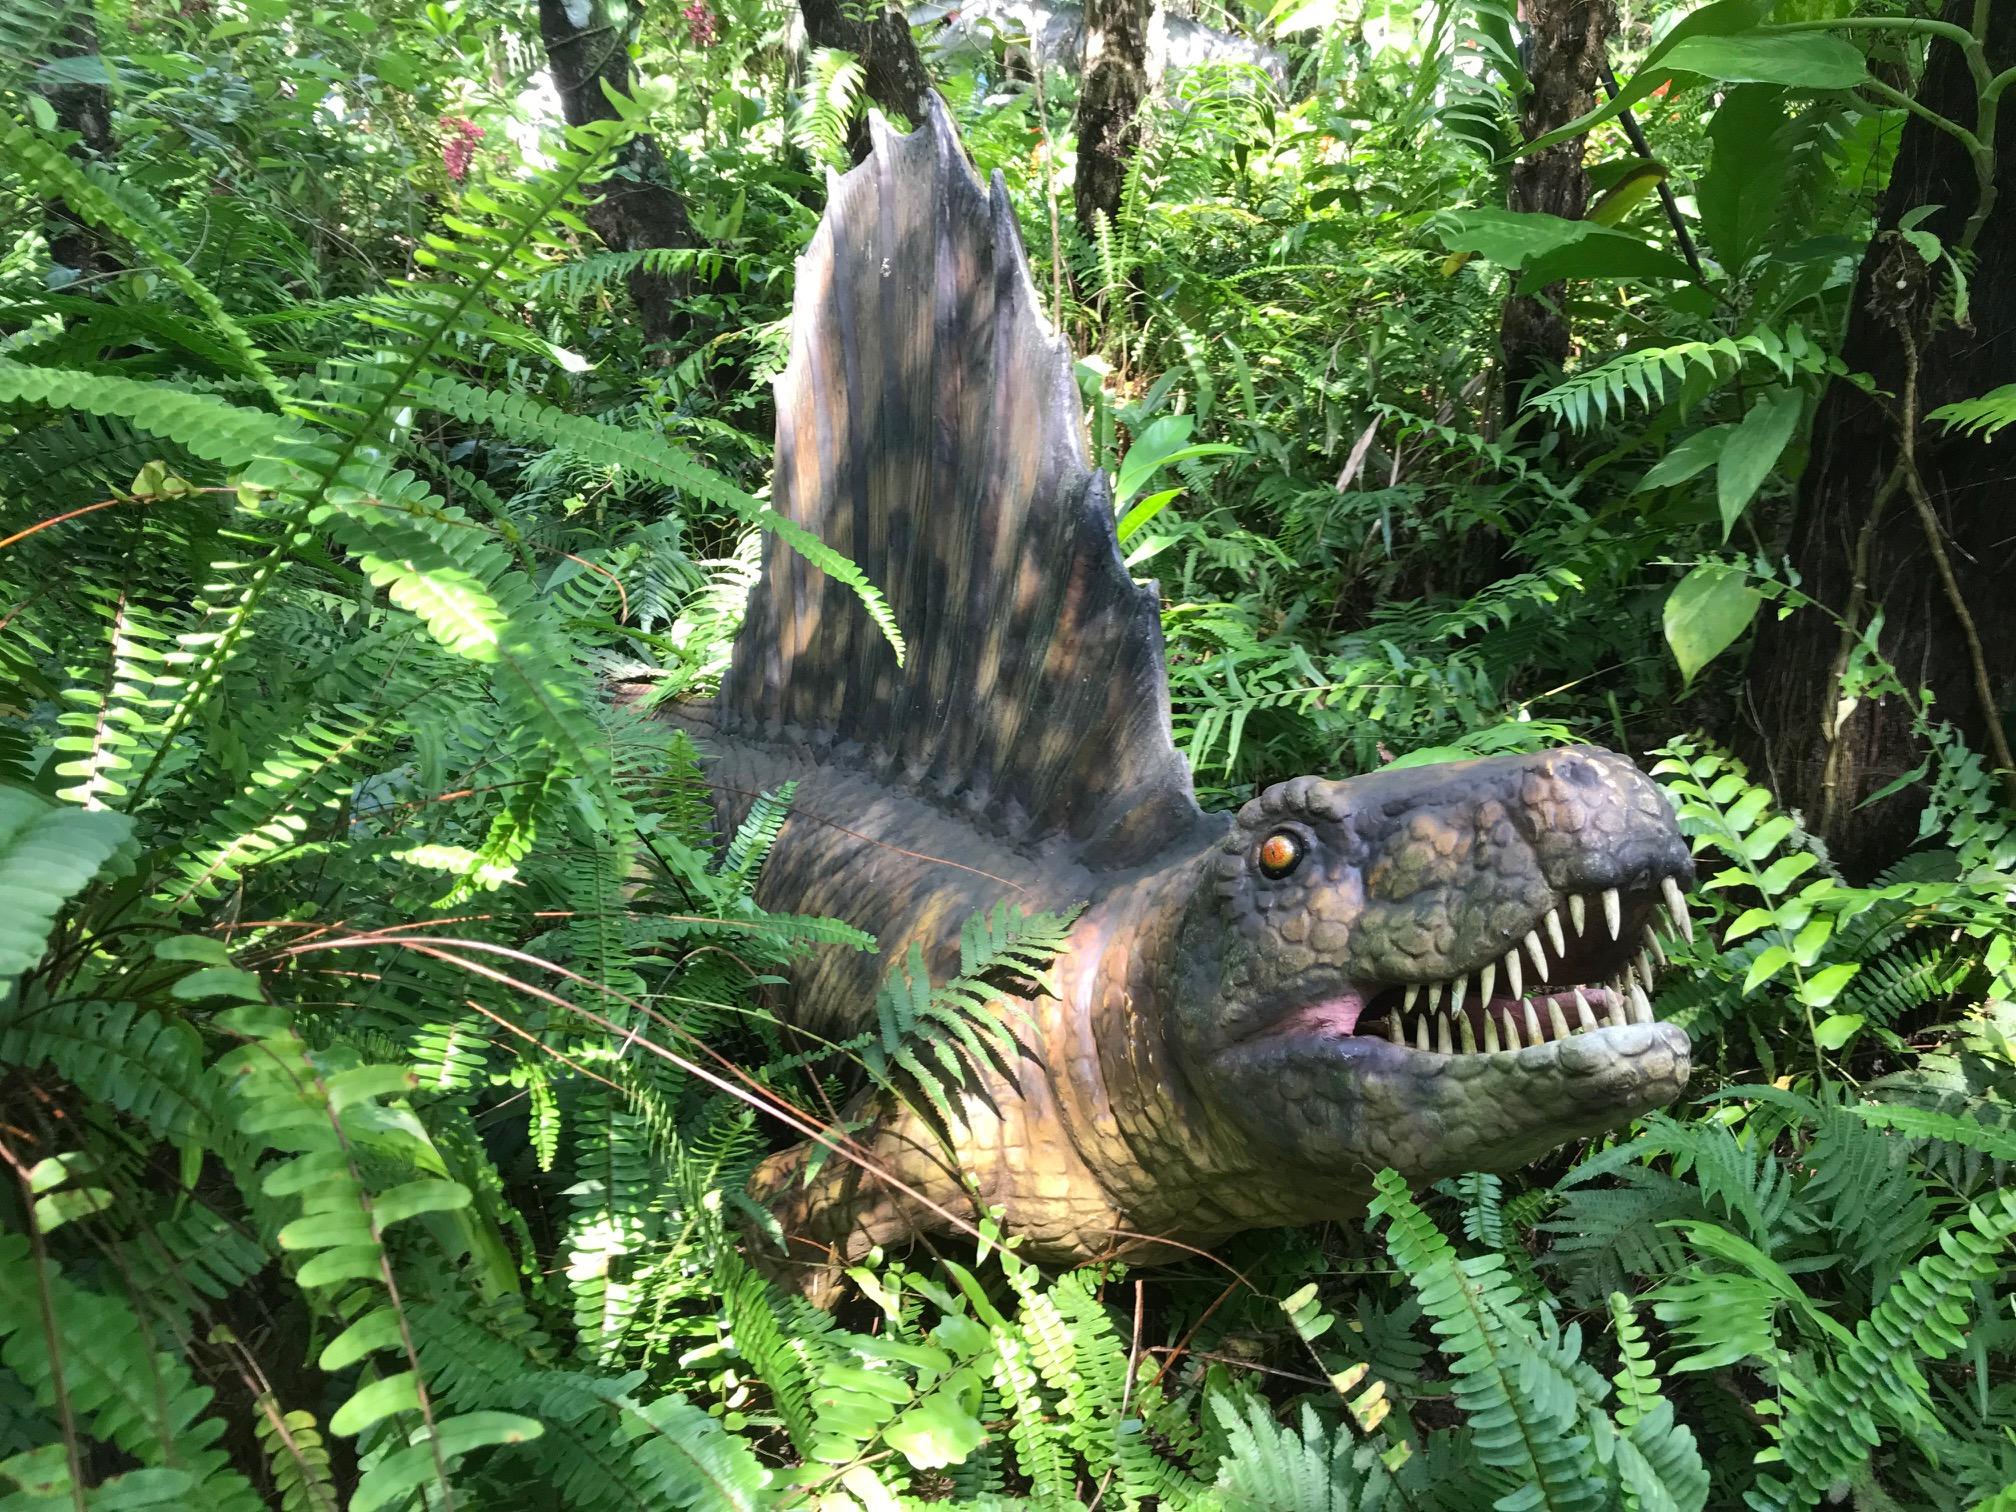 DINO恐竜PARK やんばる亜熱帯の森(沖縄県名護市/テーマパーク)